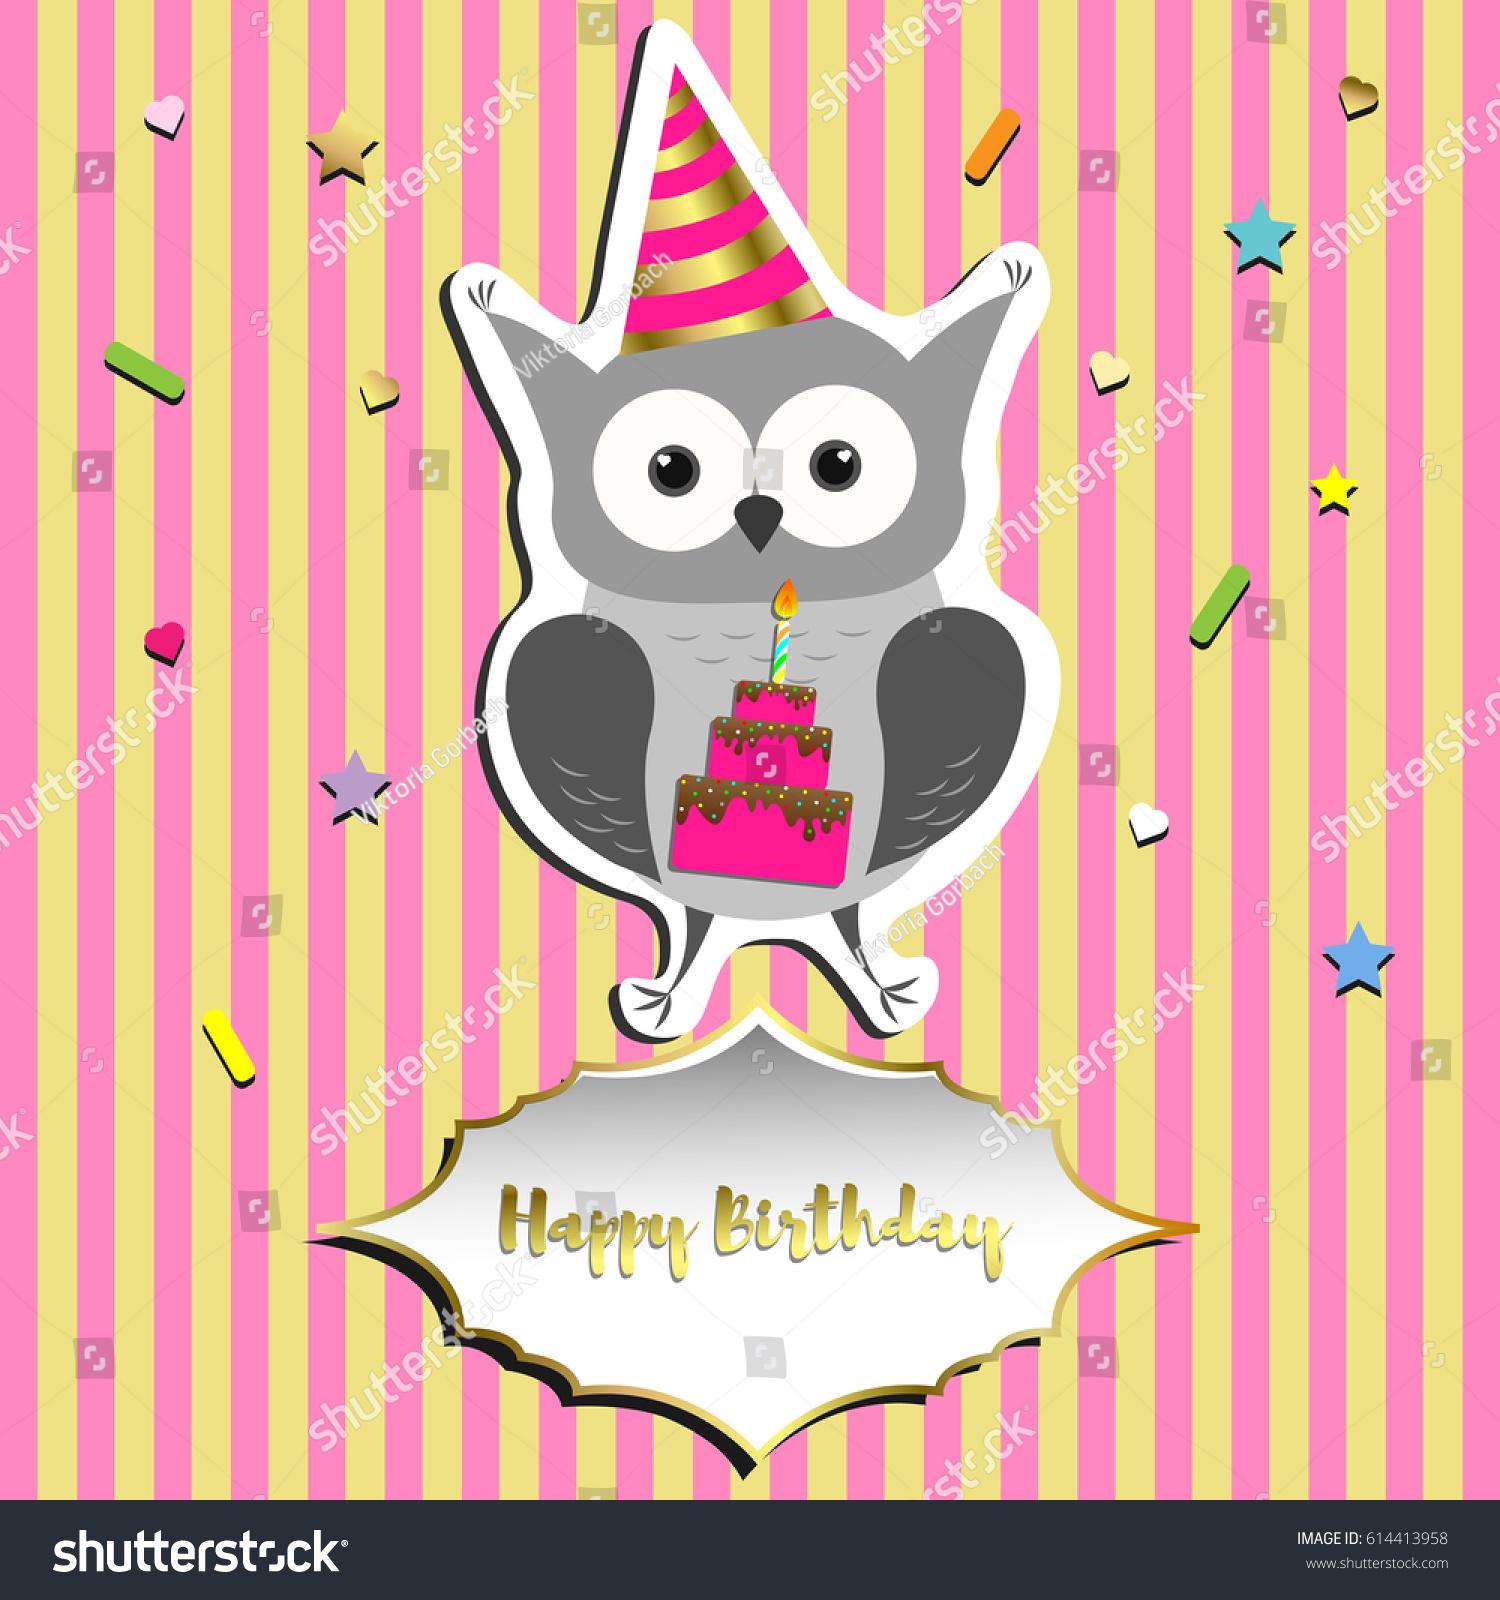 Happy Birthday Greeting Card Design Cute Stock Vector Royalty Free